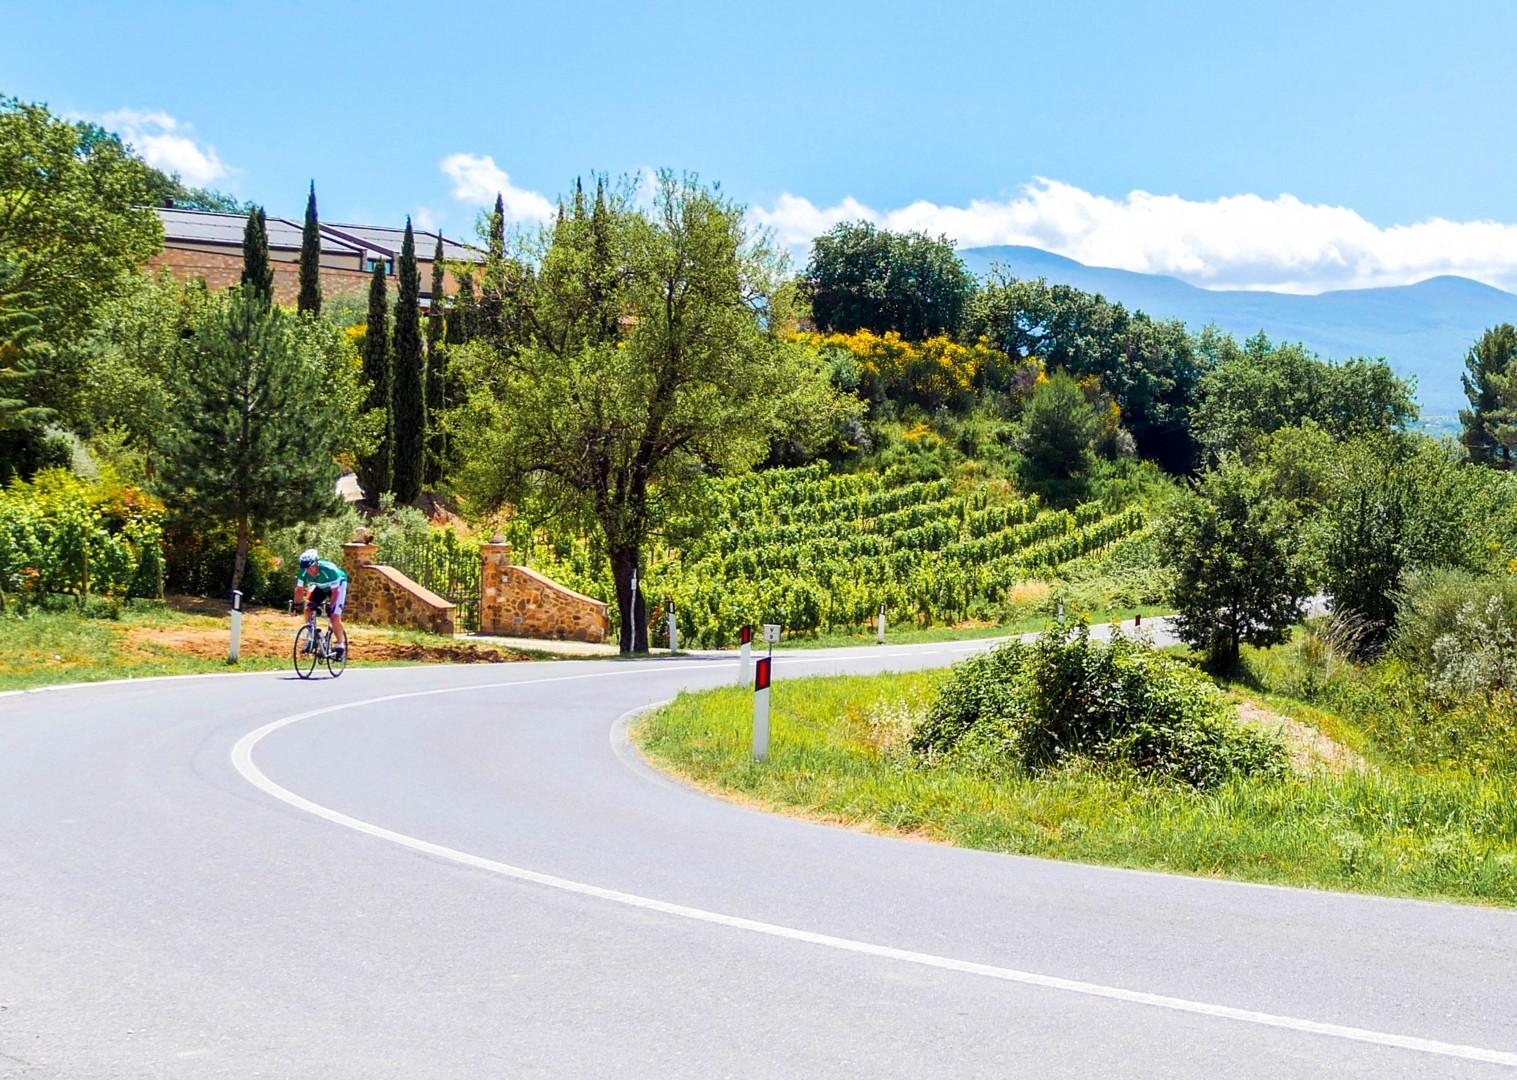 Ian-2.jpg - Italy - Tuscany - Giro della Toscana - Self-Guided Road Cycling Holiday - Road Cycling